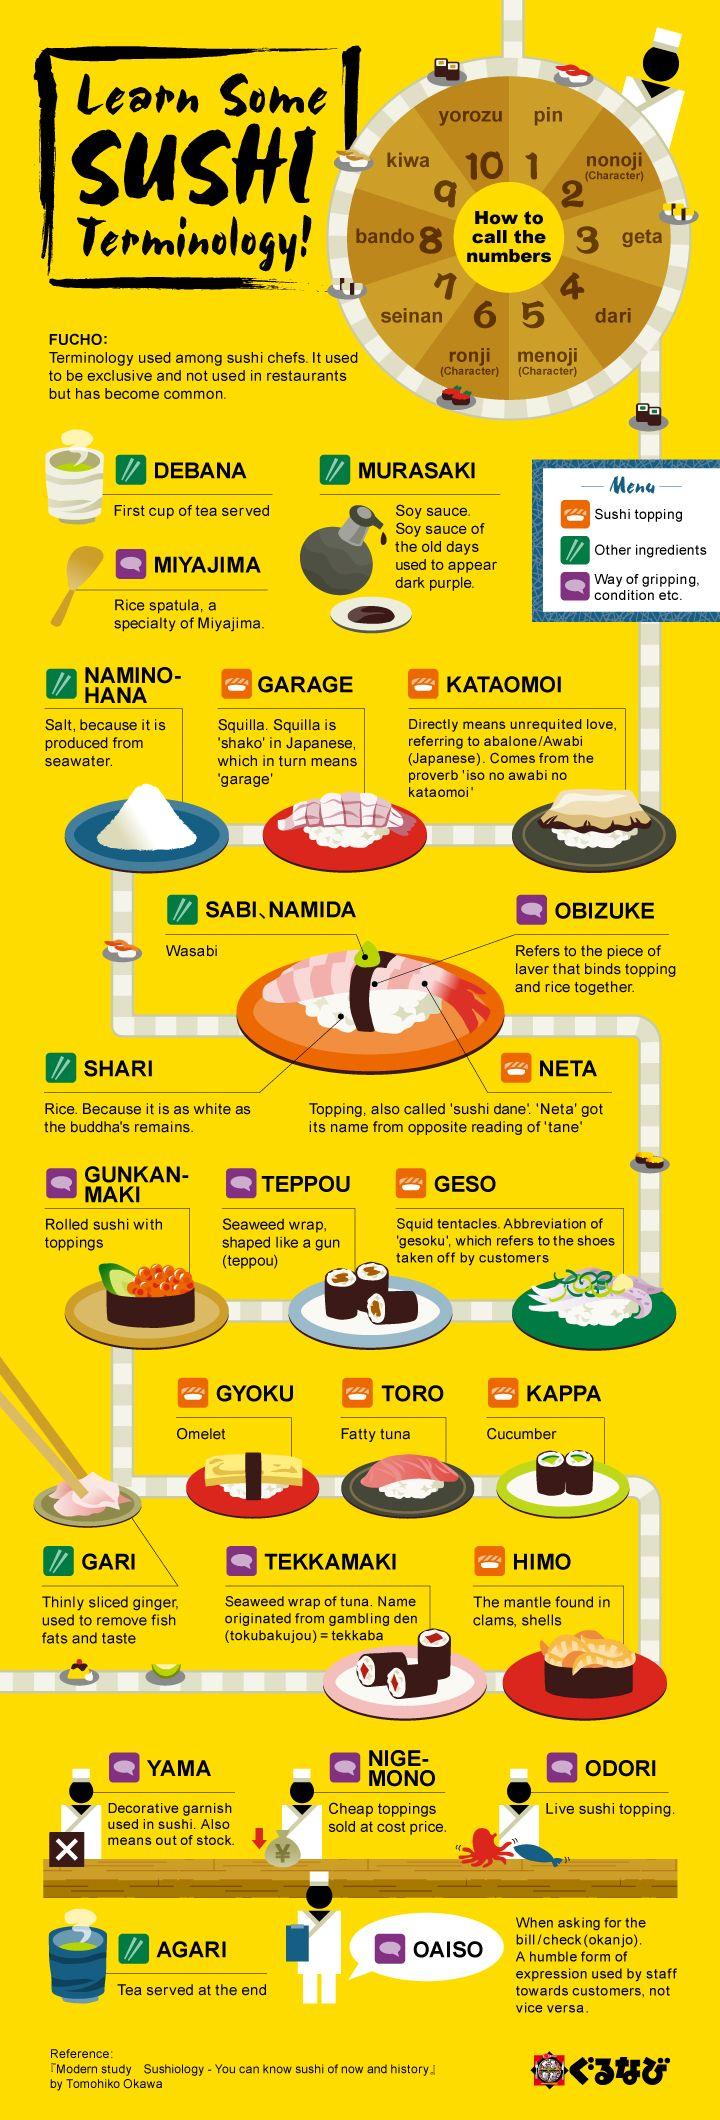 Learn Sushi Terminology